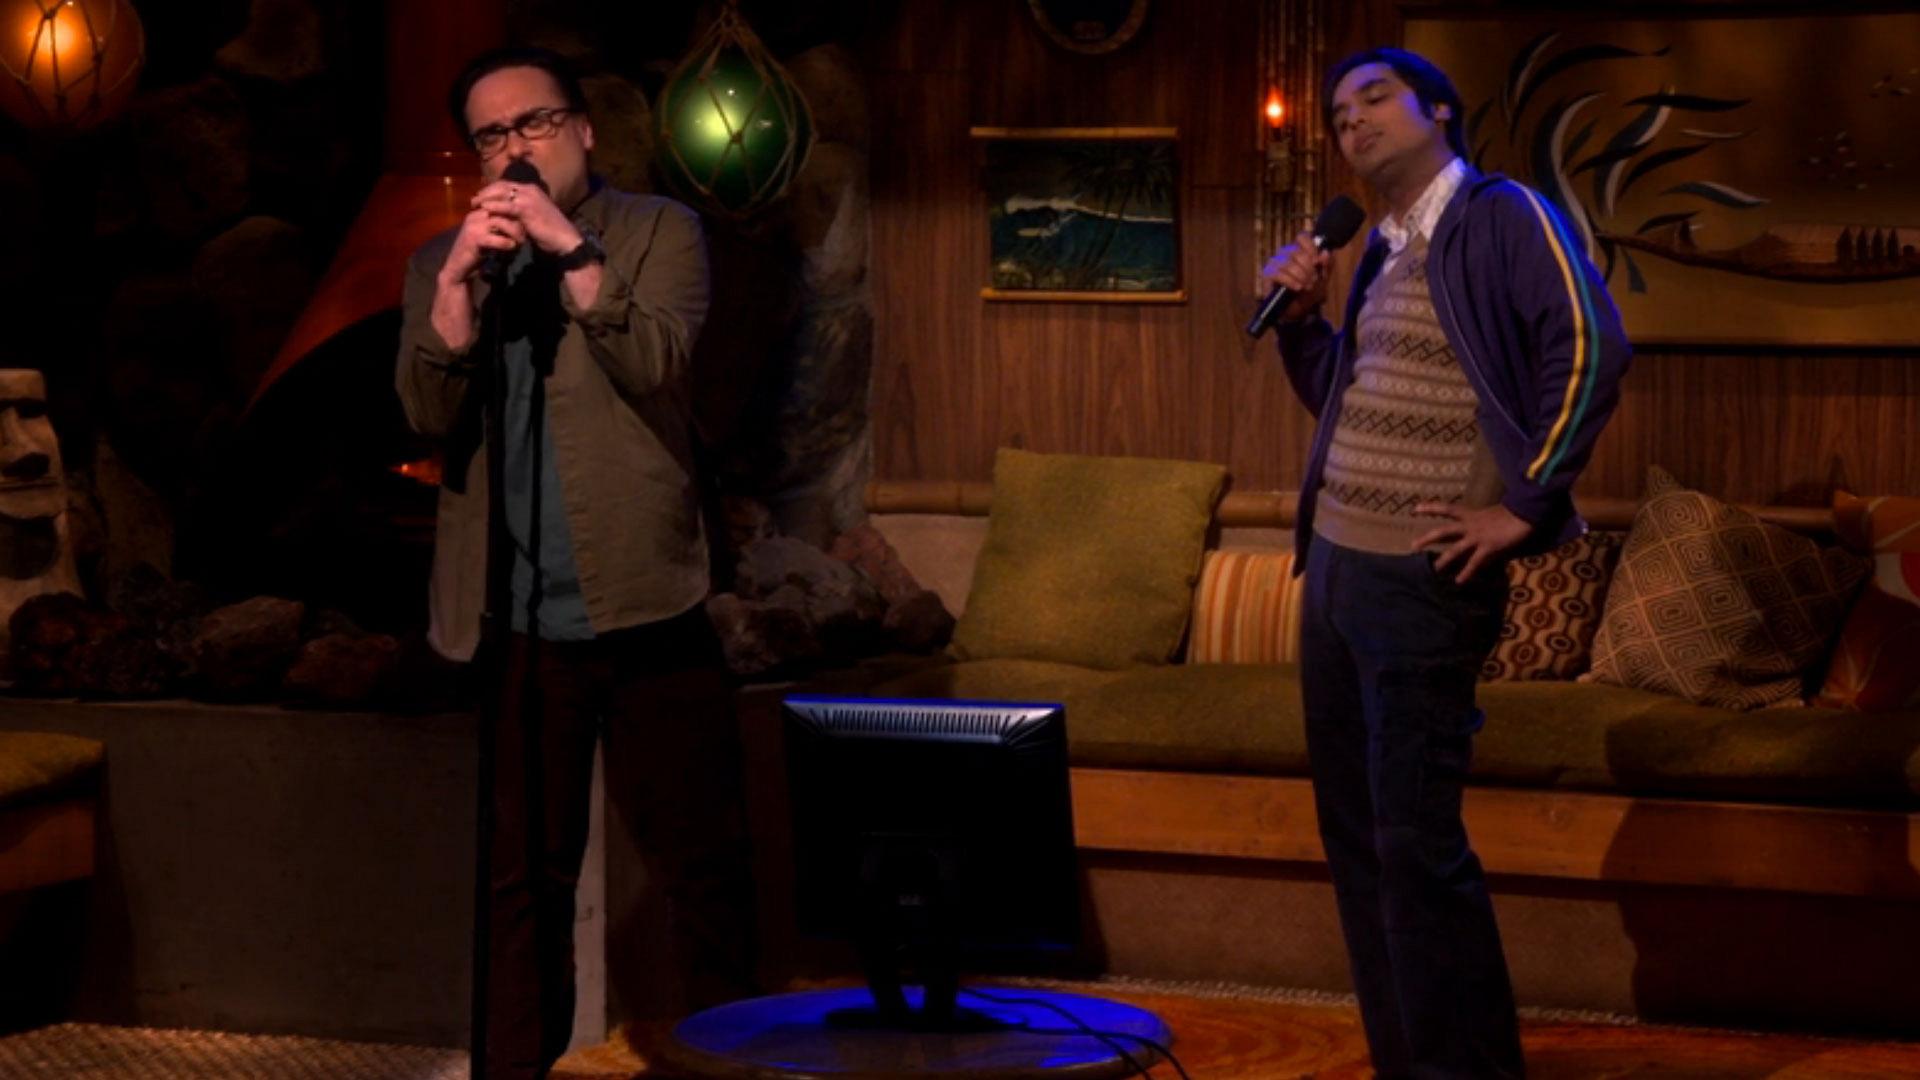 Burst into song at your local karaoke bar.